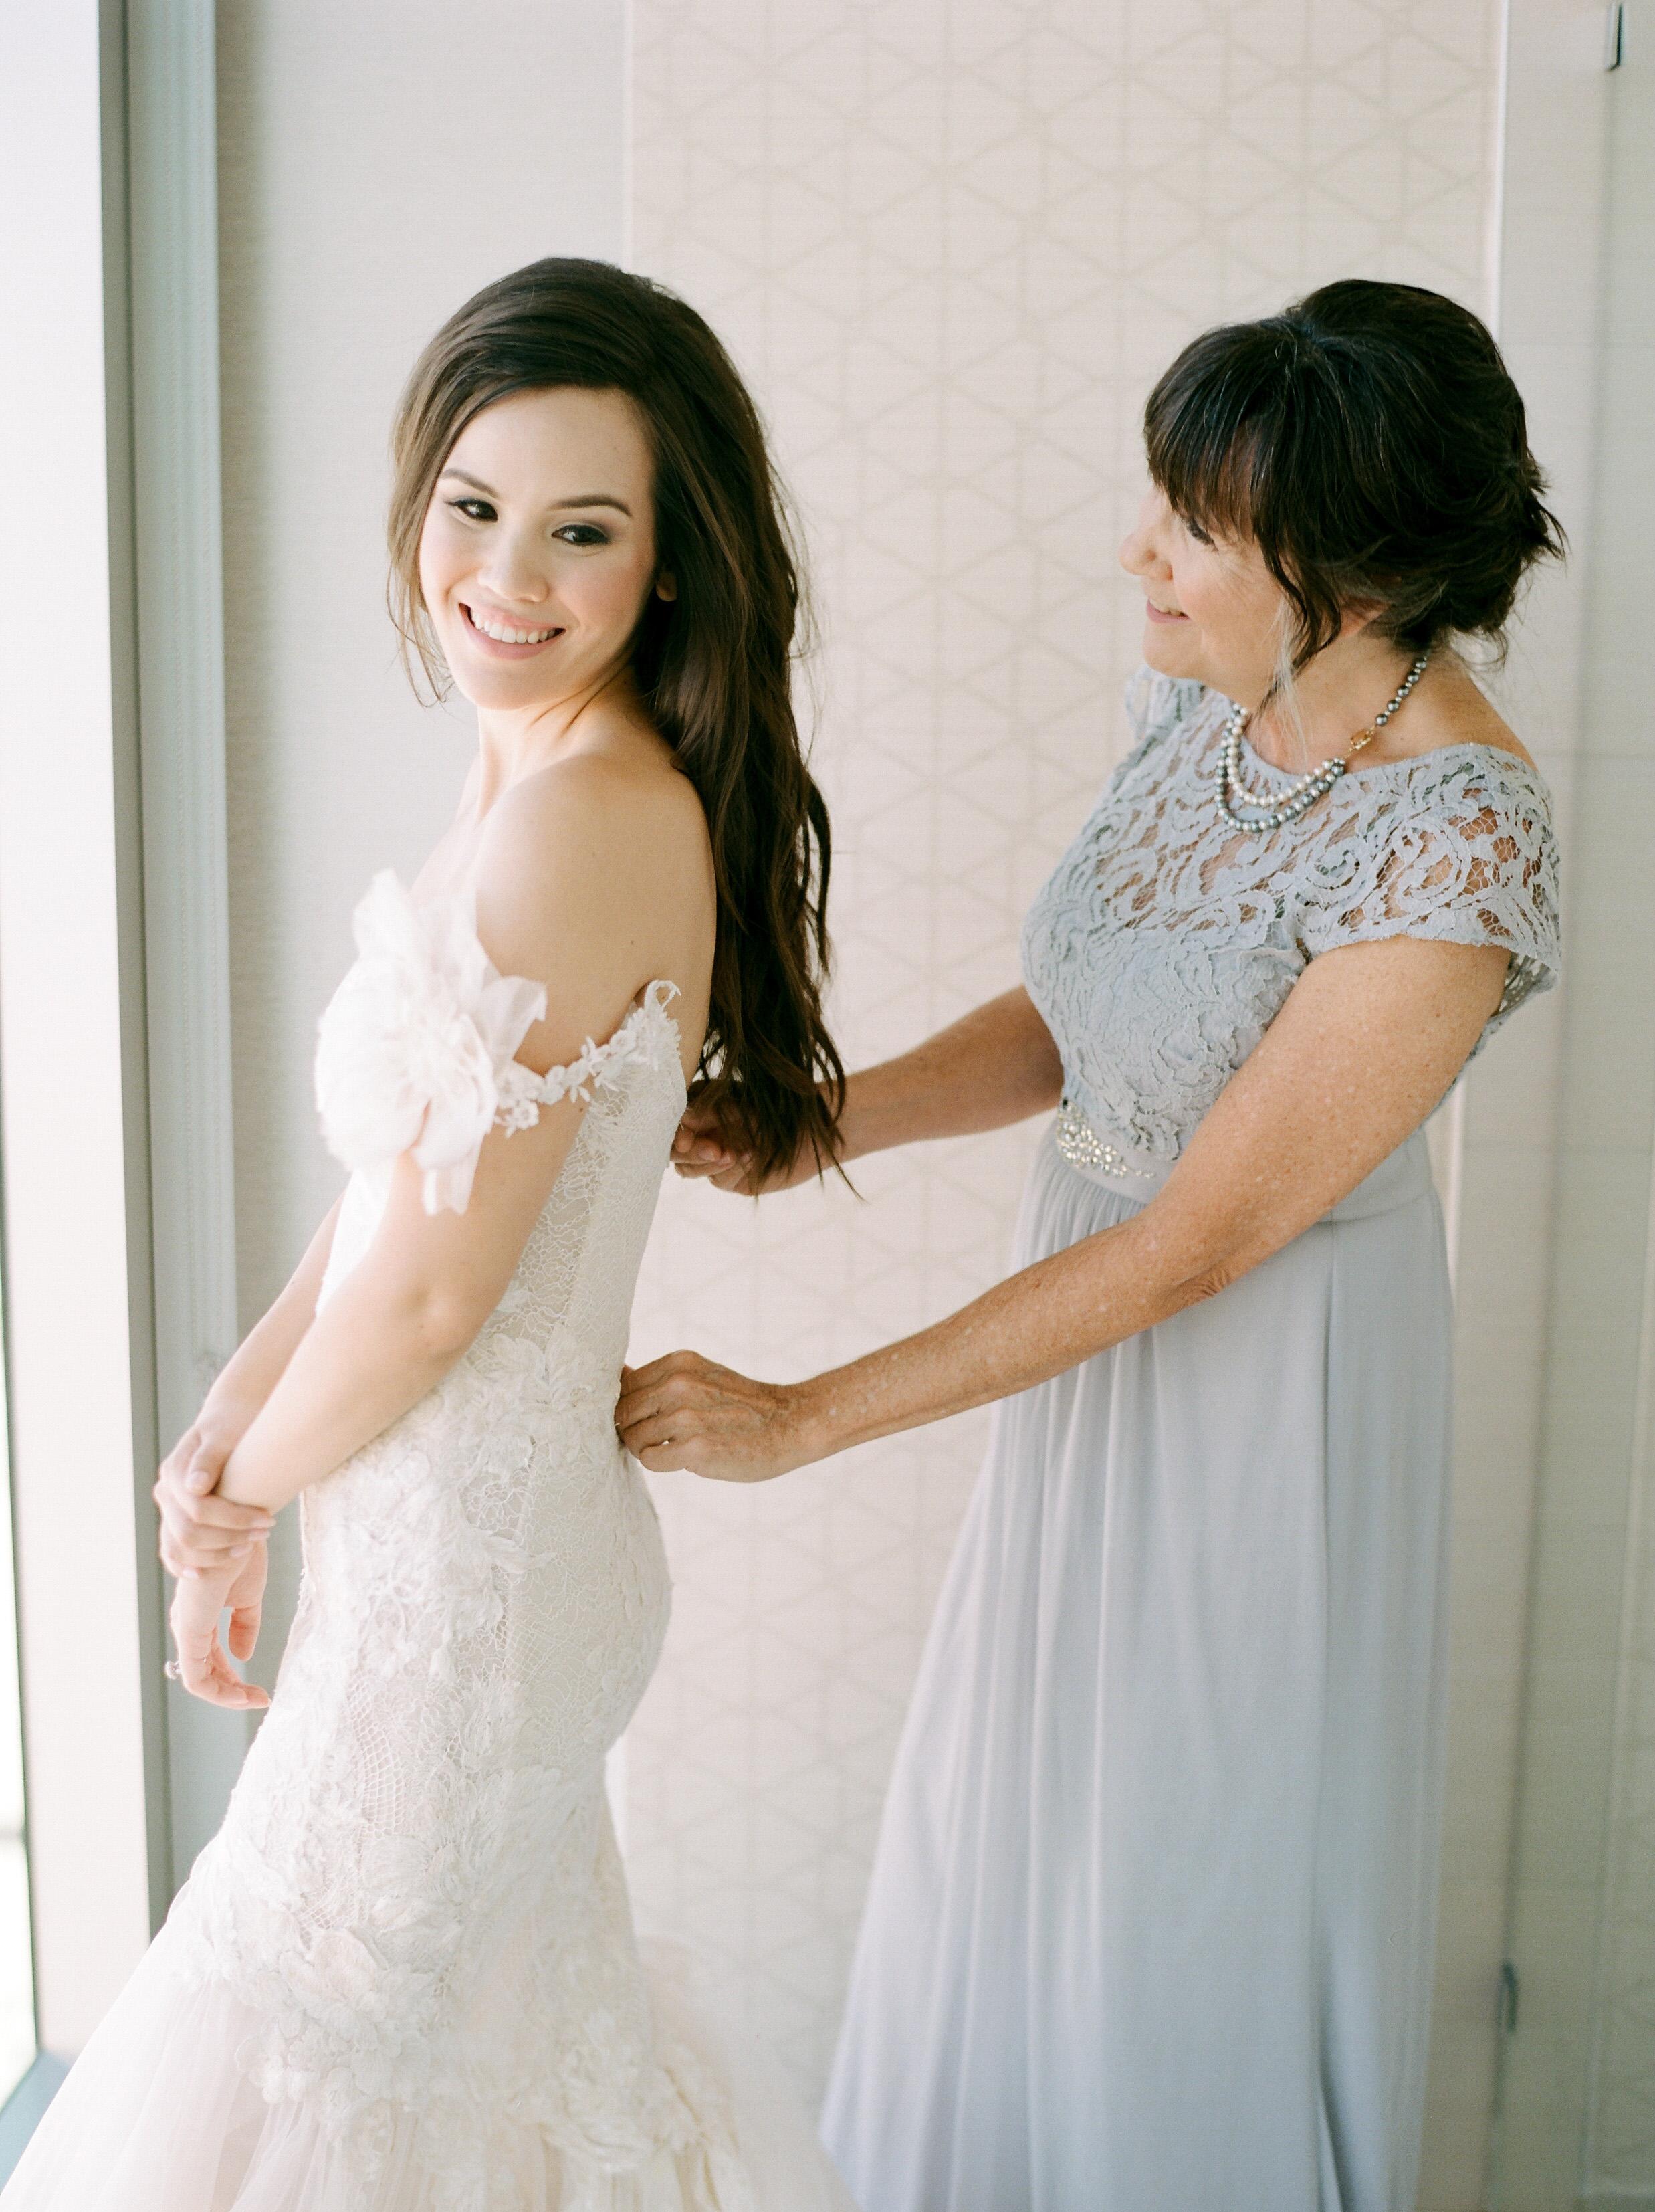 Martha-Stewart-Wedding-Dana-Fernandez-Photography-Josh-Texas-Film-Houston-Wedding-Fine-Art-Photographer-McGovern-Centennial-Gardens-Top-Best-4.jpg